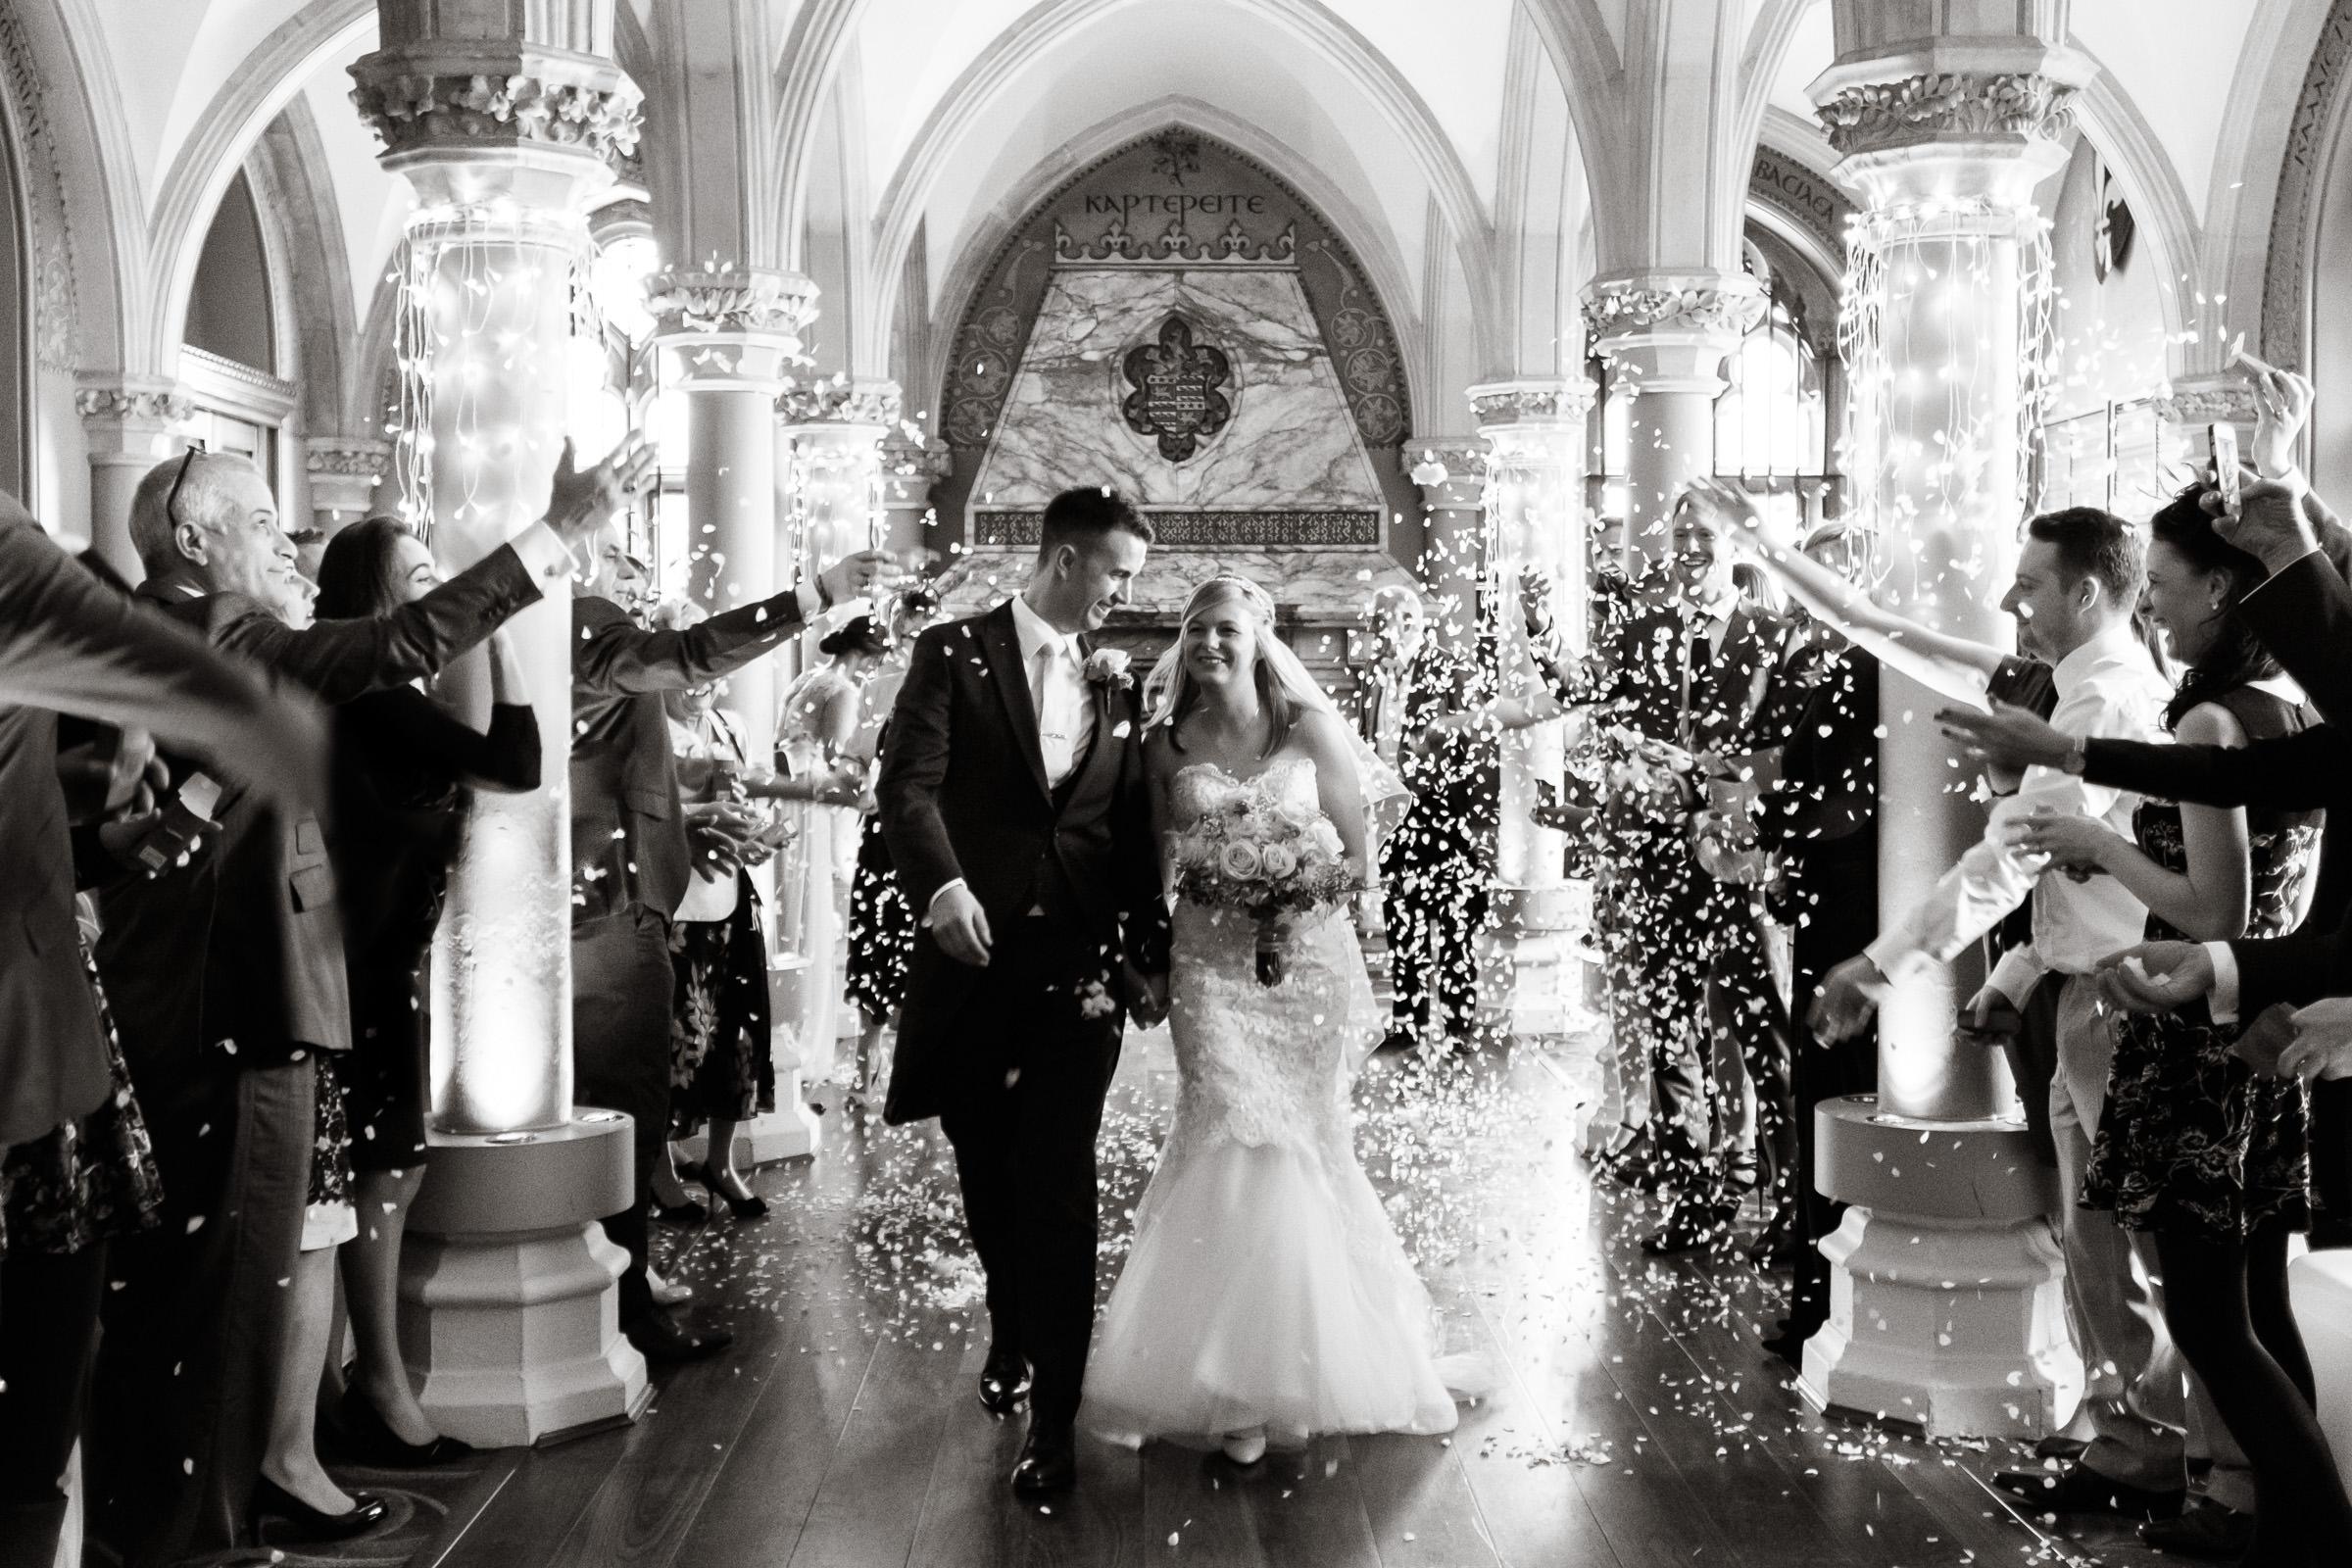 Donna & Nick's Wedding at Wotton House in Dorking 014.jpg